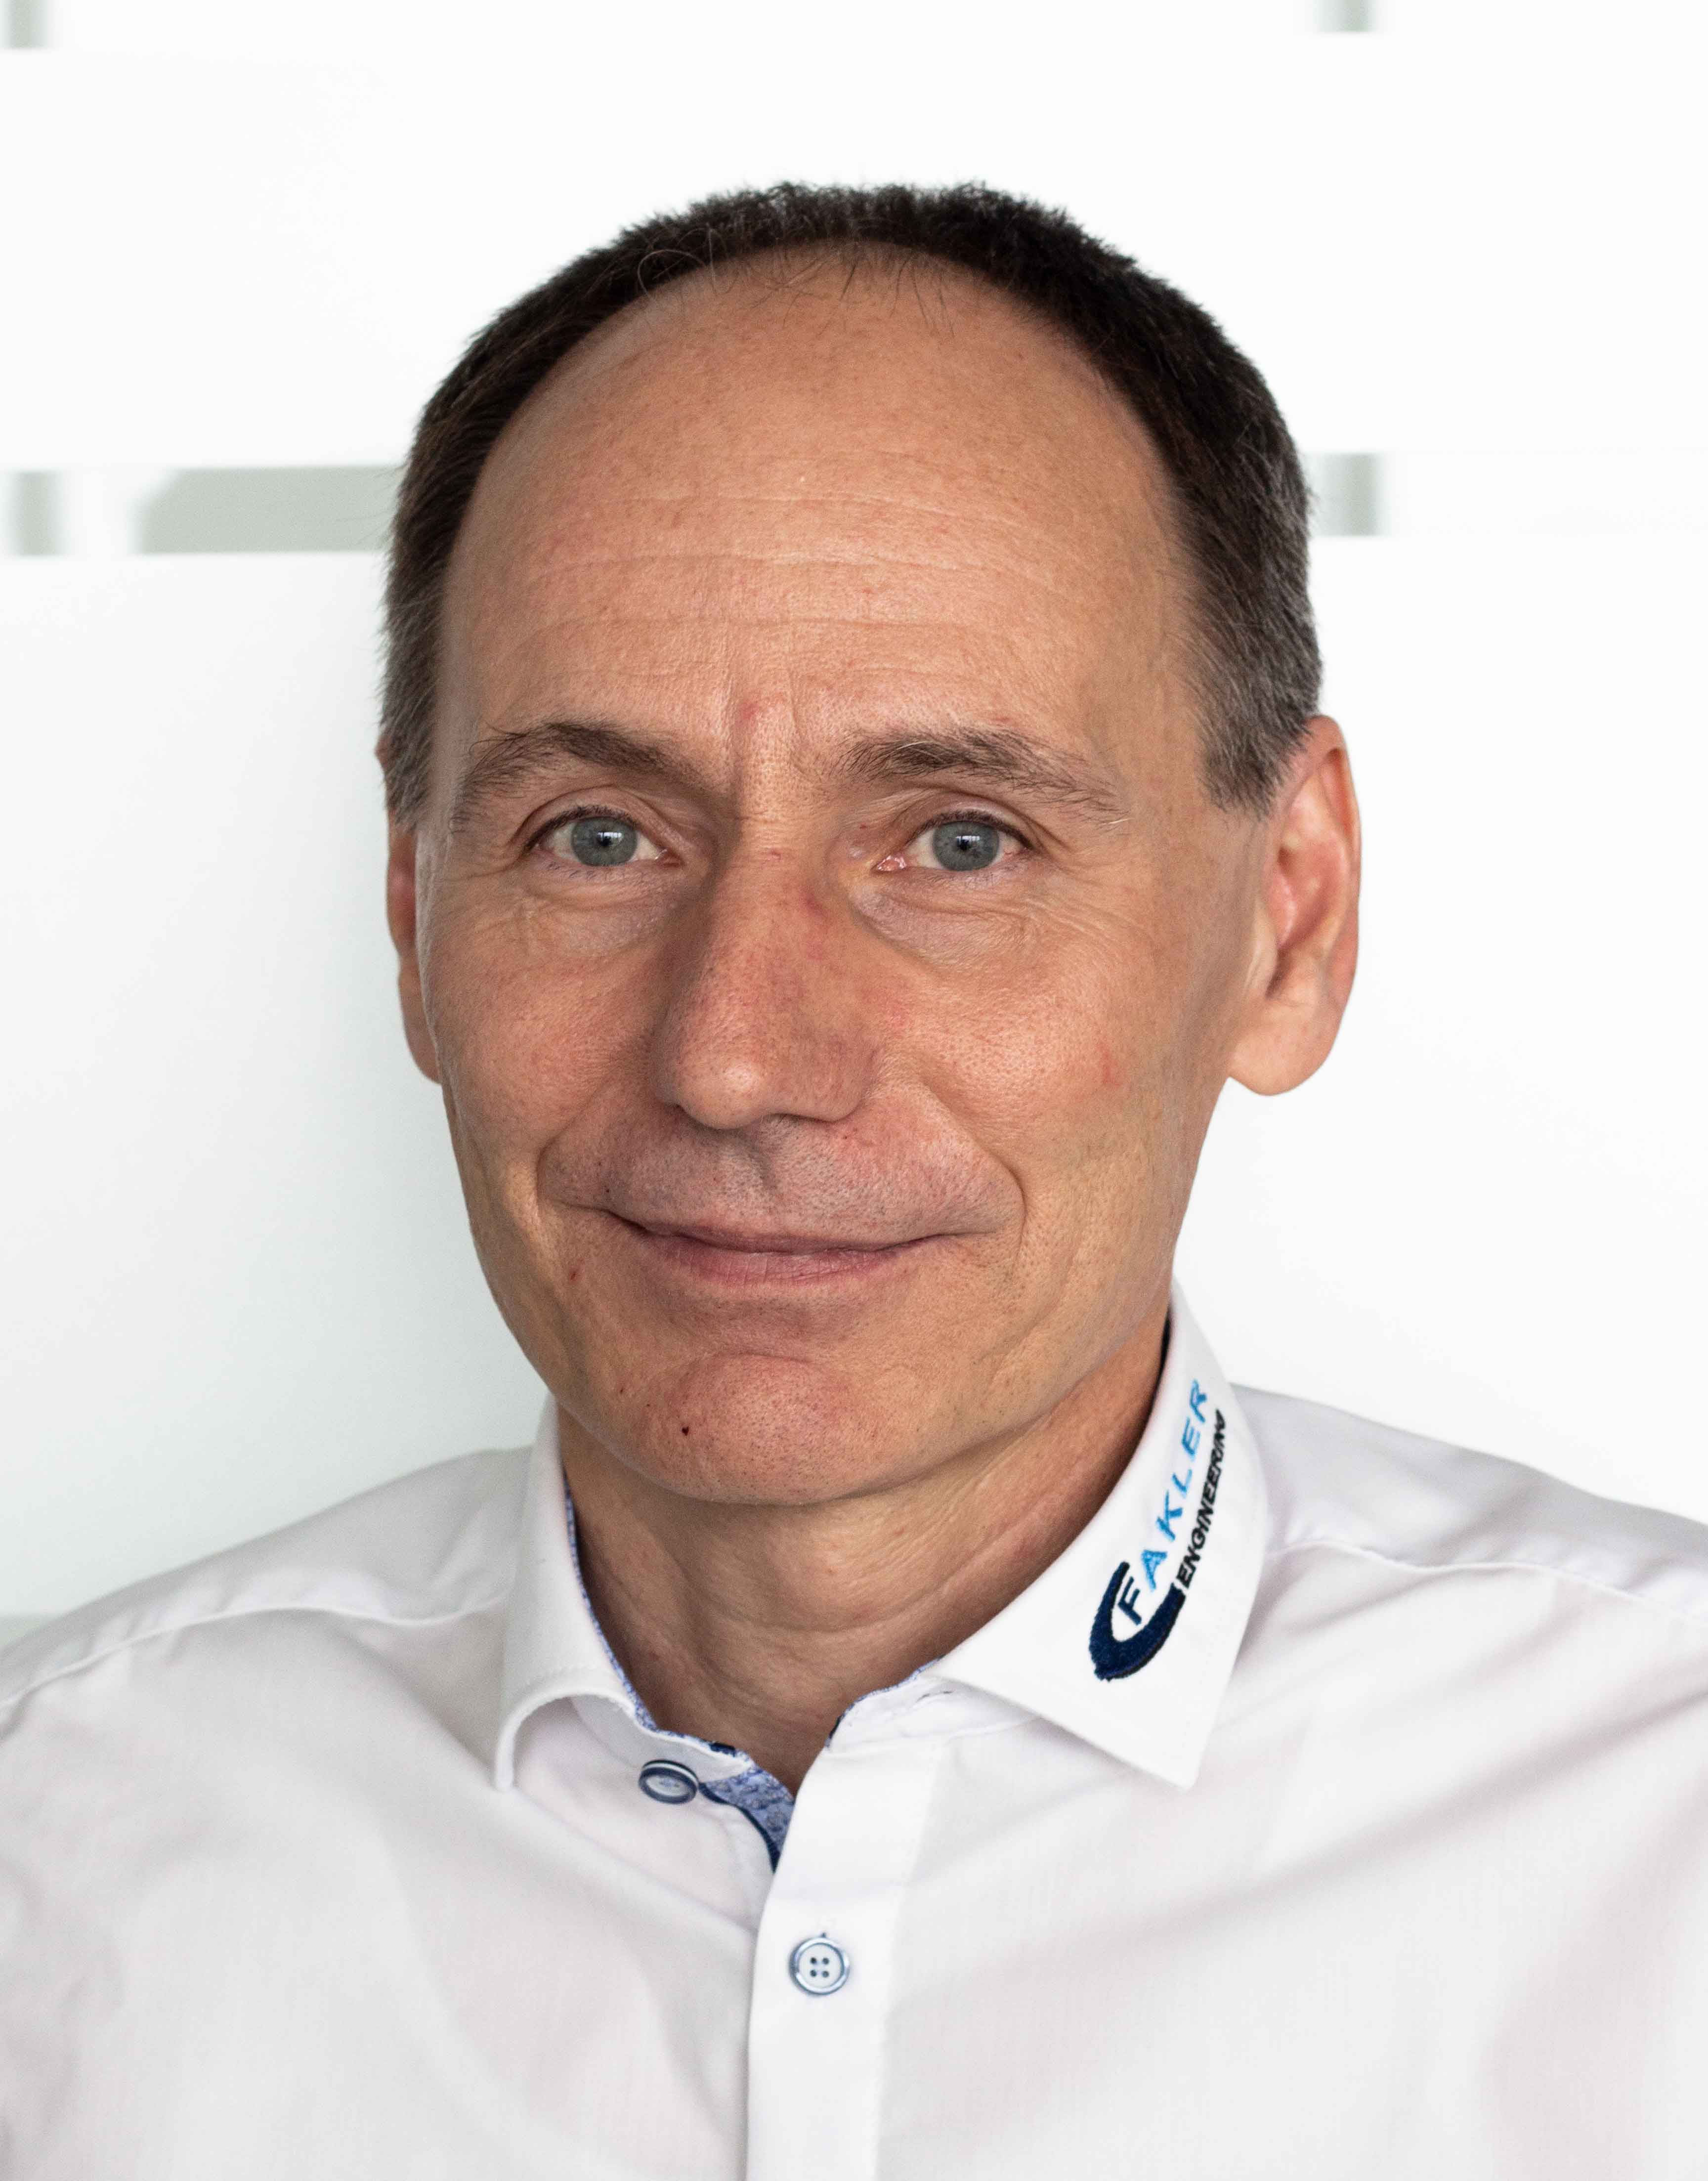 Wolfgang Jans